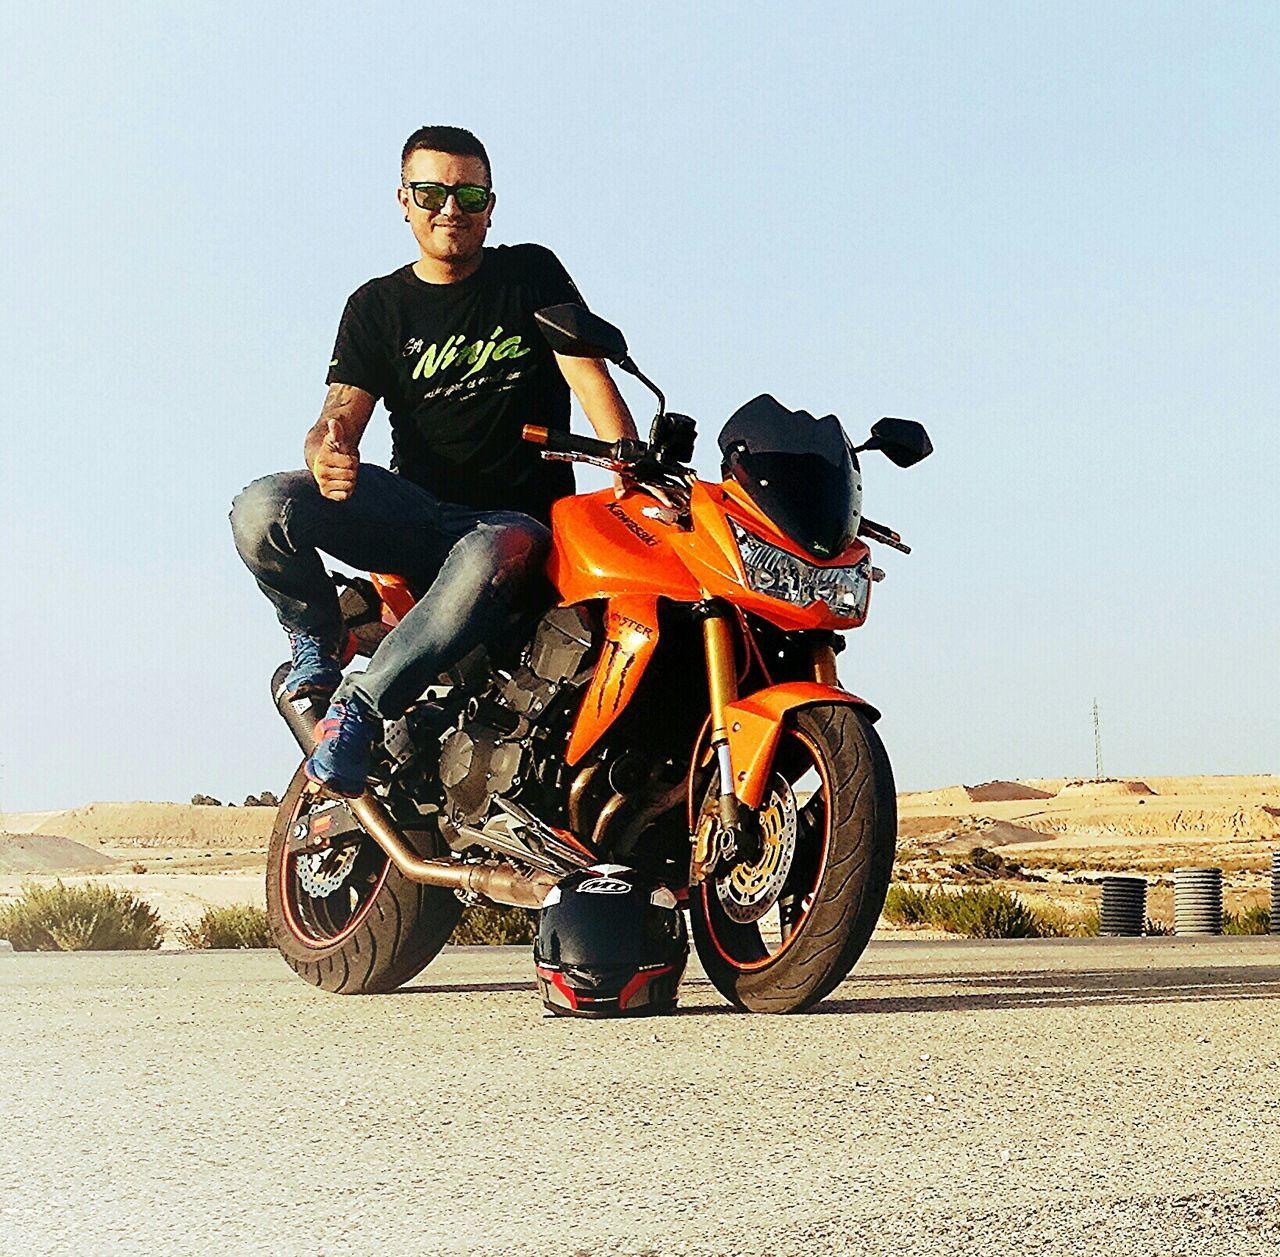 Soy Ninja. .mi Sangre Es Verde Kawa EyeEm Best Shots EyeEm Best Edits Streamzoofamily Motorcycles España La Mancha Hello World